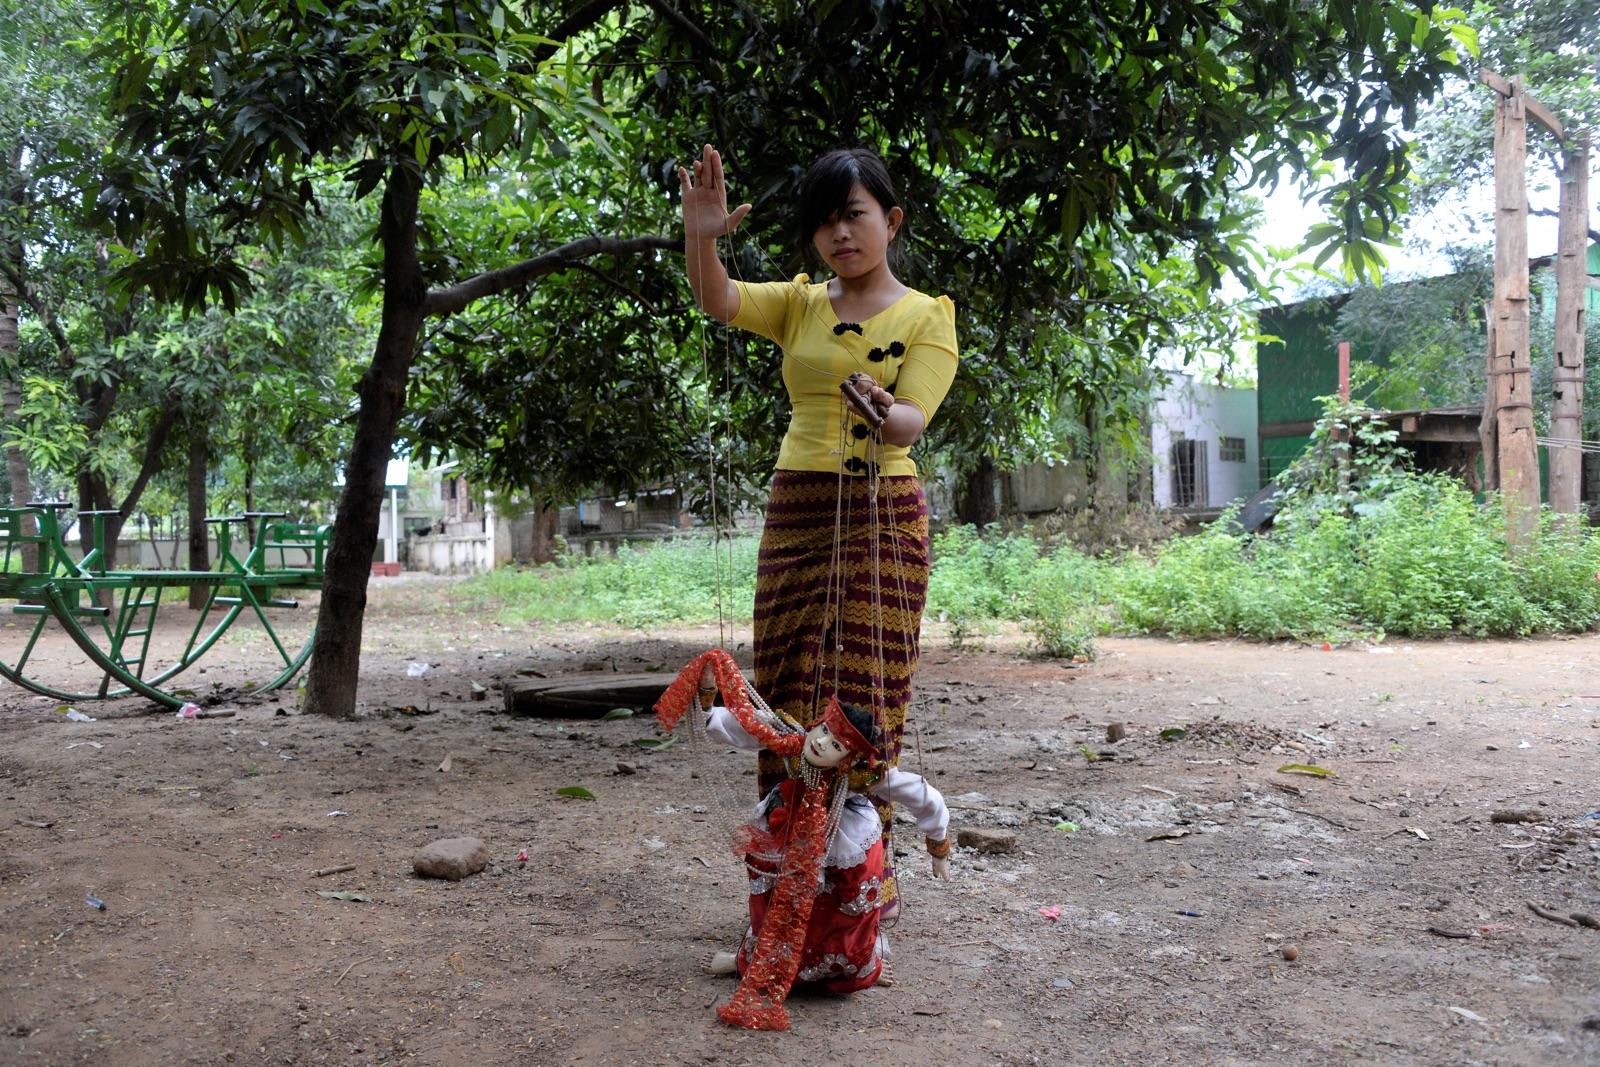 Myanmar Marionette Puppets (13) - New Naratif